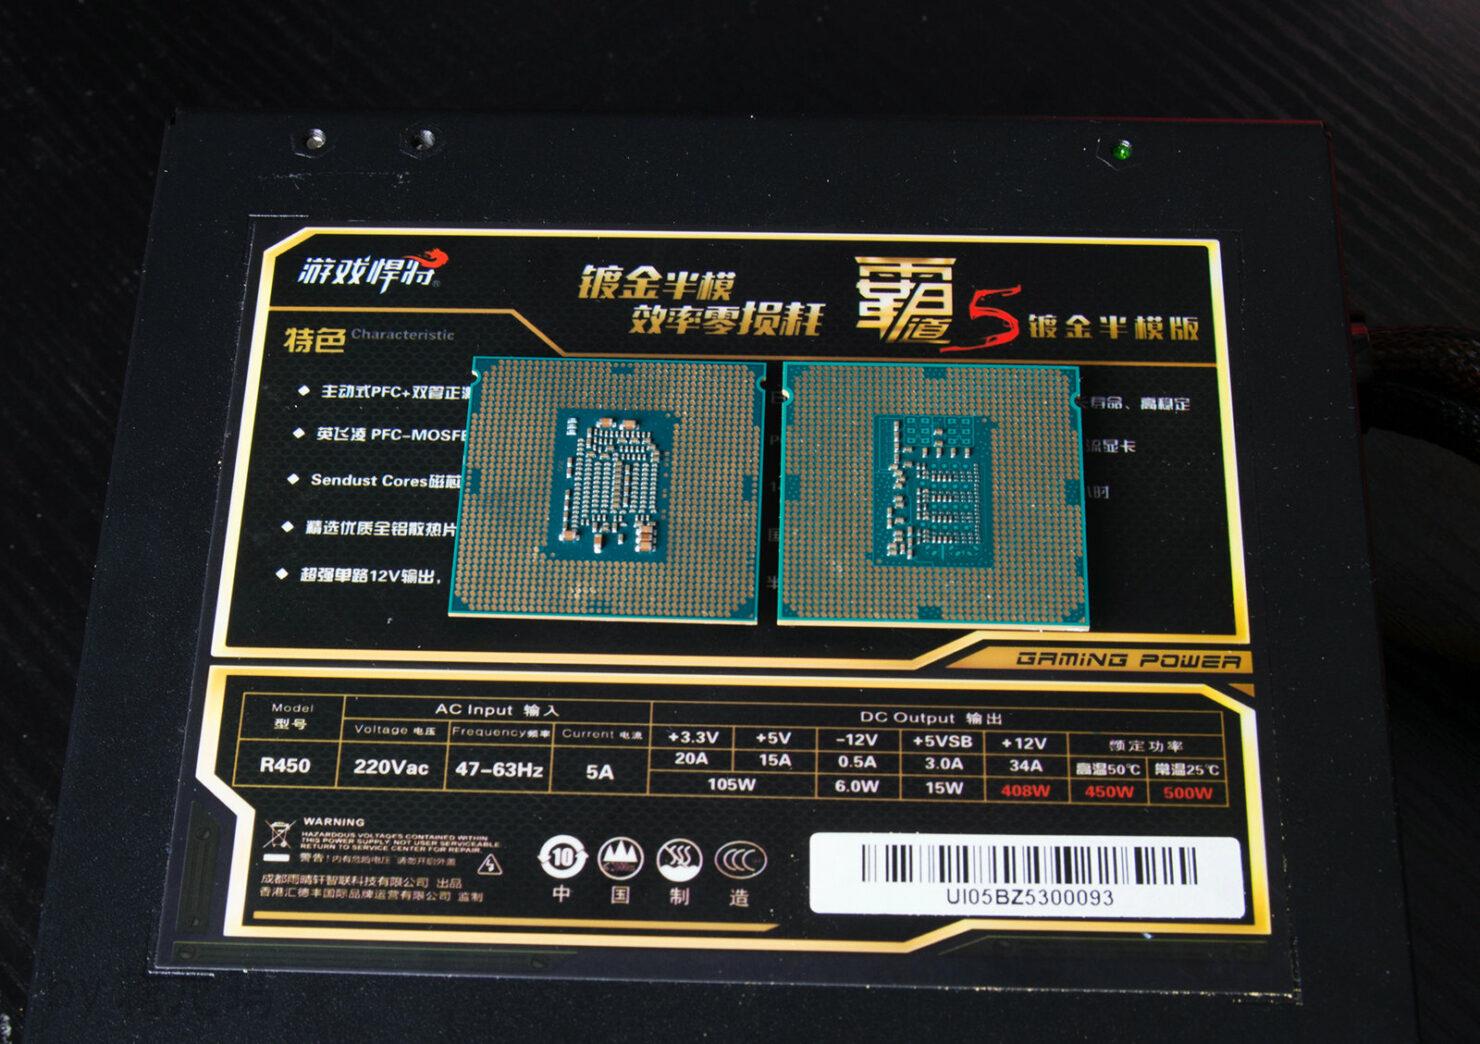 intel-core-i7-6700k-vs-core-i7-4790k_processor-back